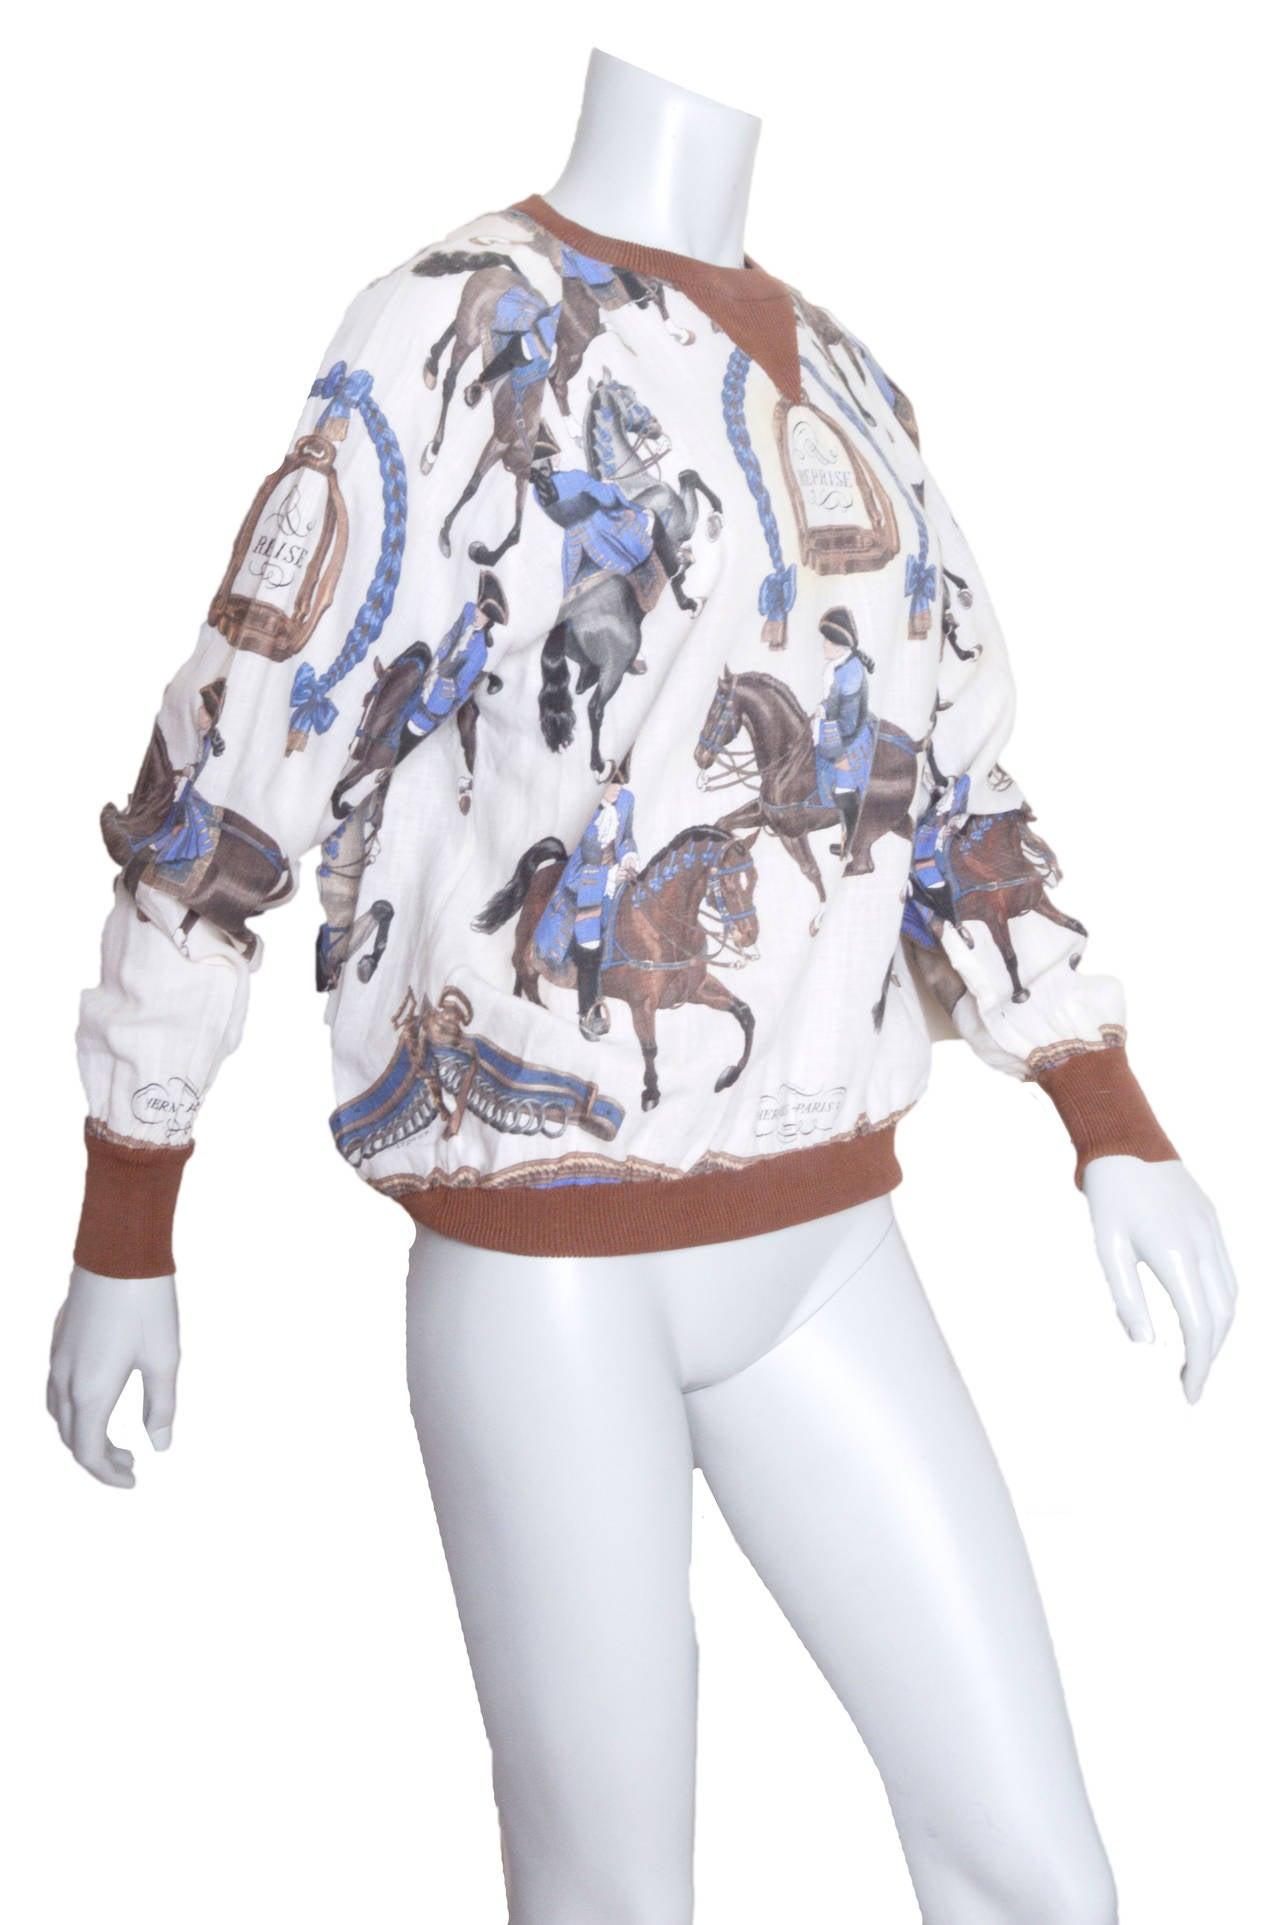 Hermes Equestrian Scarf Print Blouse 2